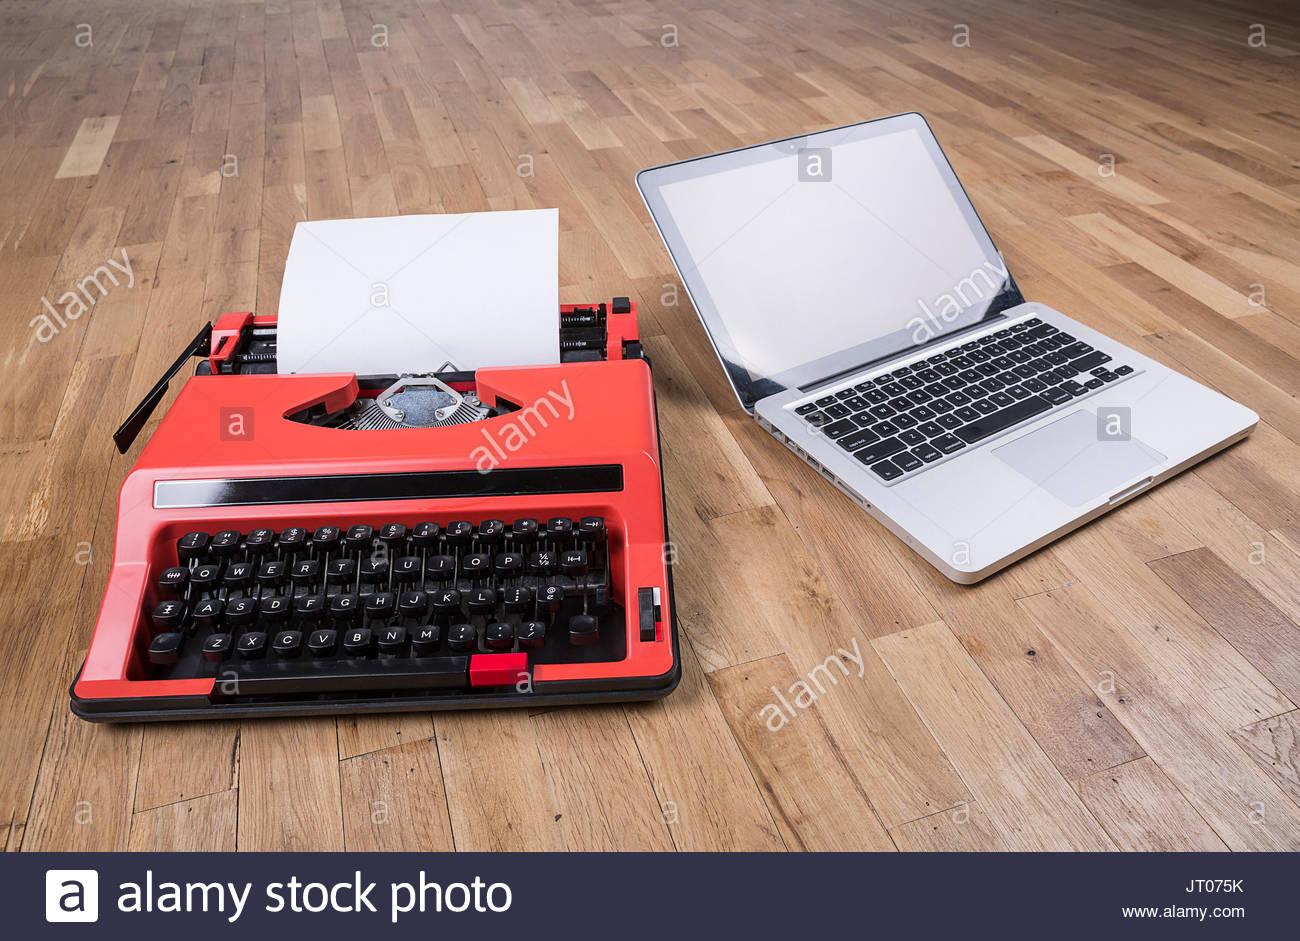 Business, Dinge, Computer, moderne, zeitgenössische, Evolution, Evolution, Evolution, tragbarer Computer, Laptop, Stockbild